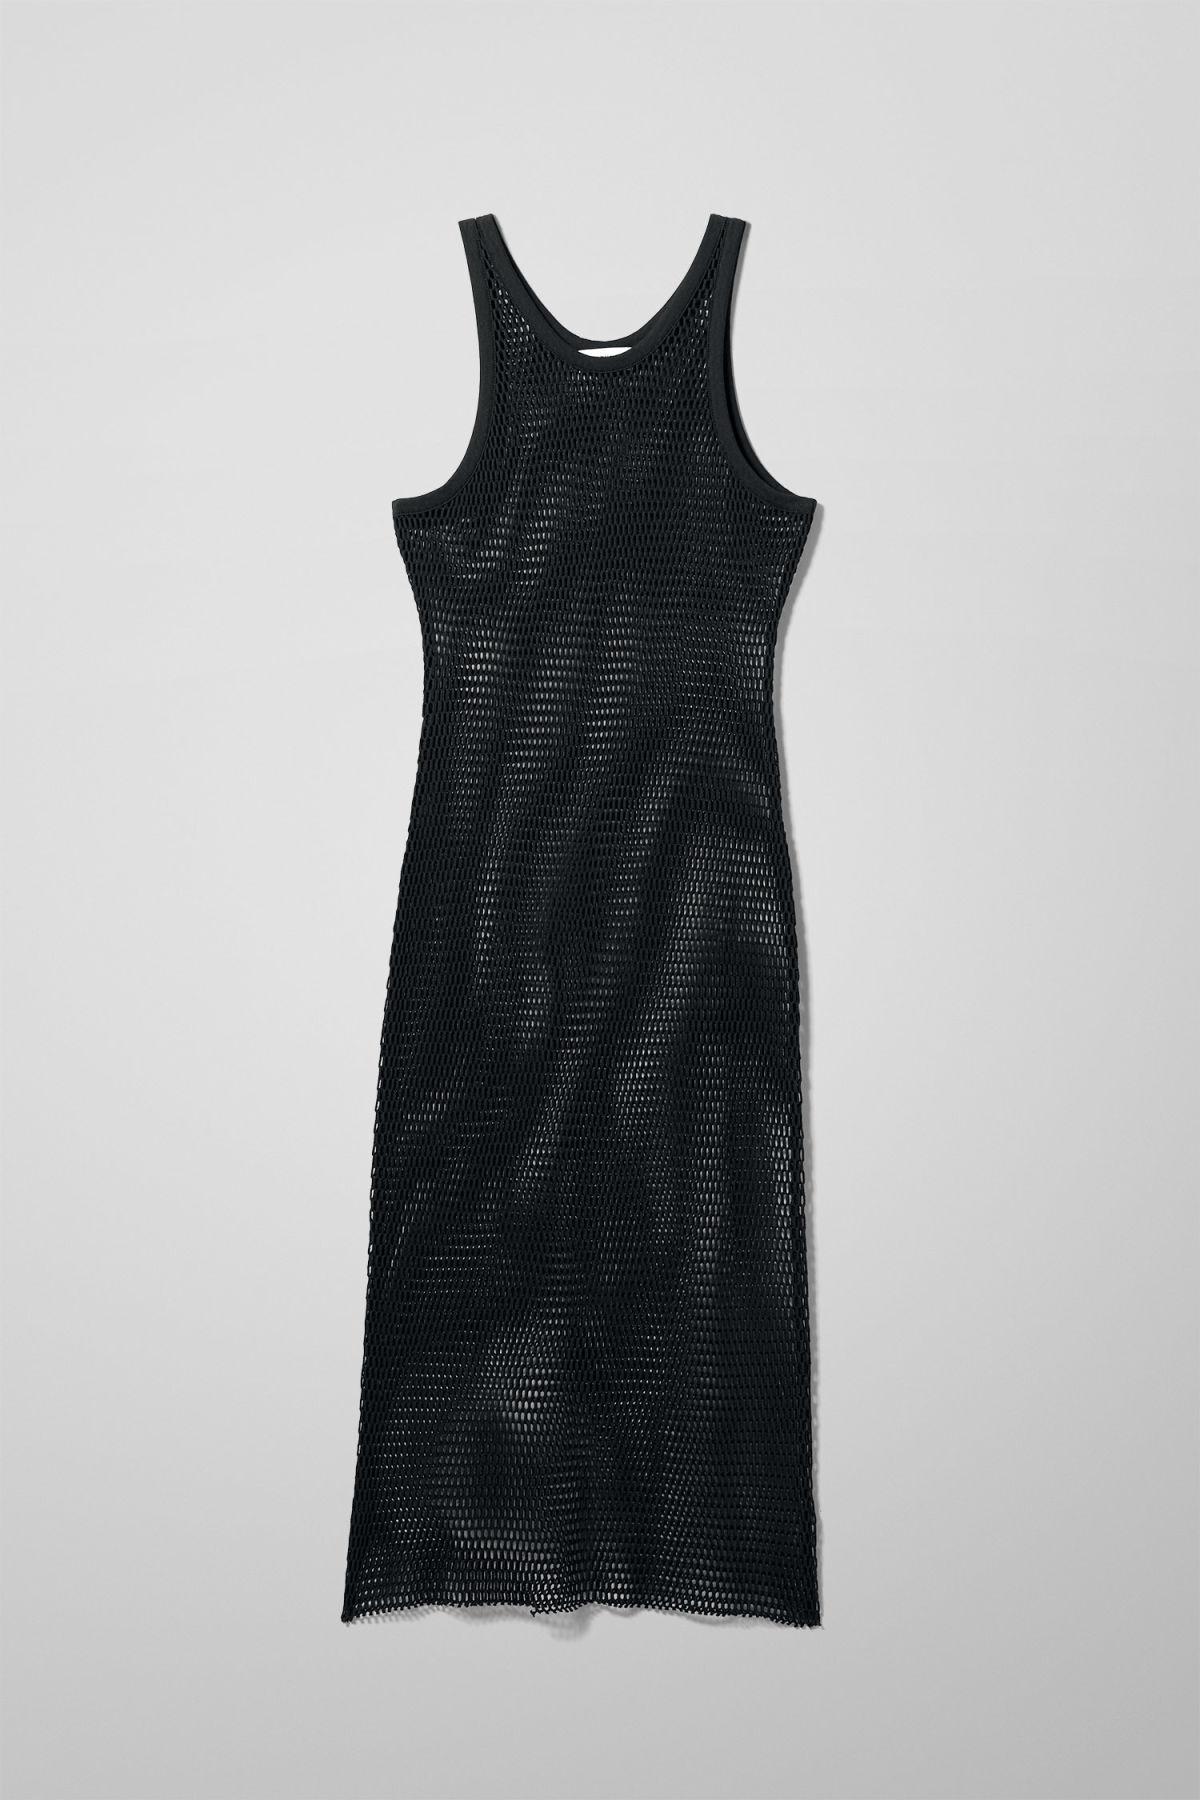 Image of Play Net Dress - Black-M